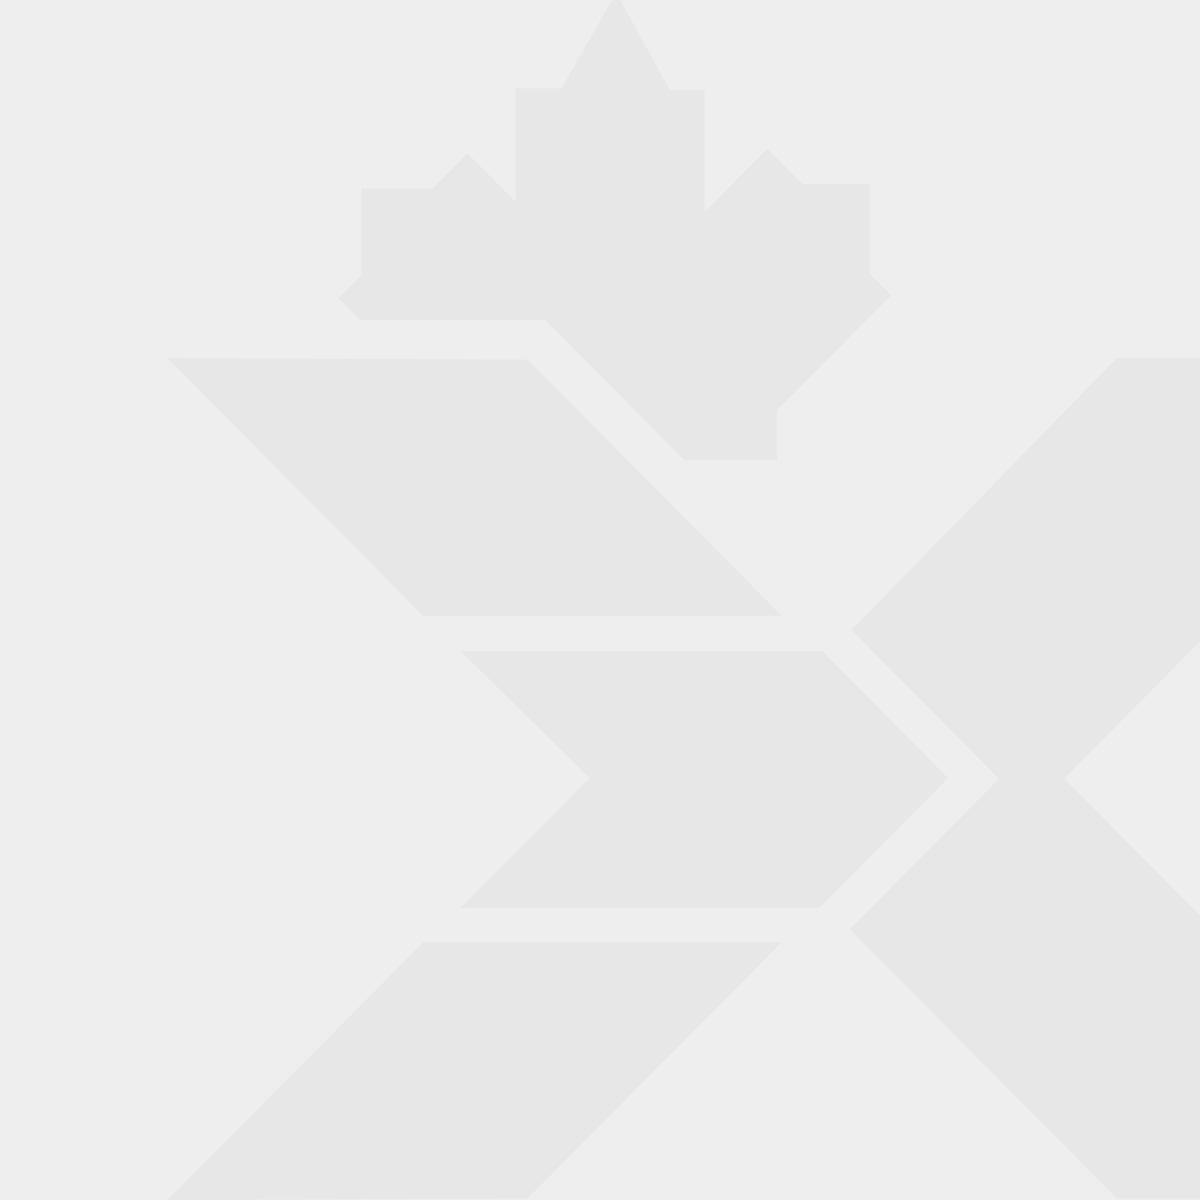 Royal Canadian Air Force Men's 3 Pack Bilingual T-Shirts